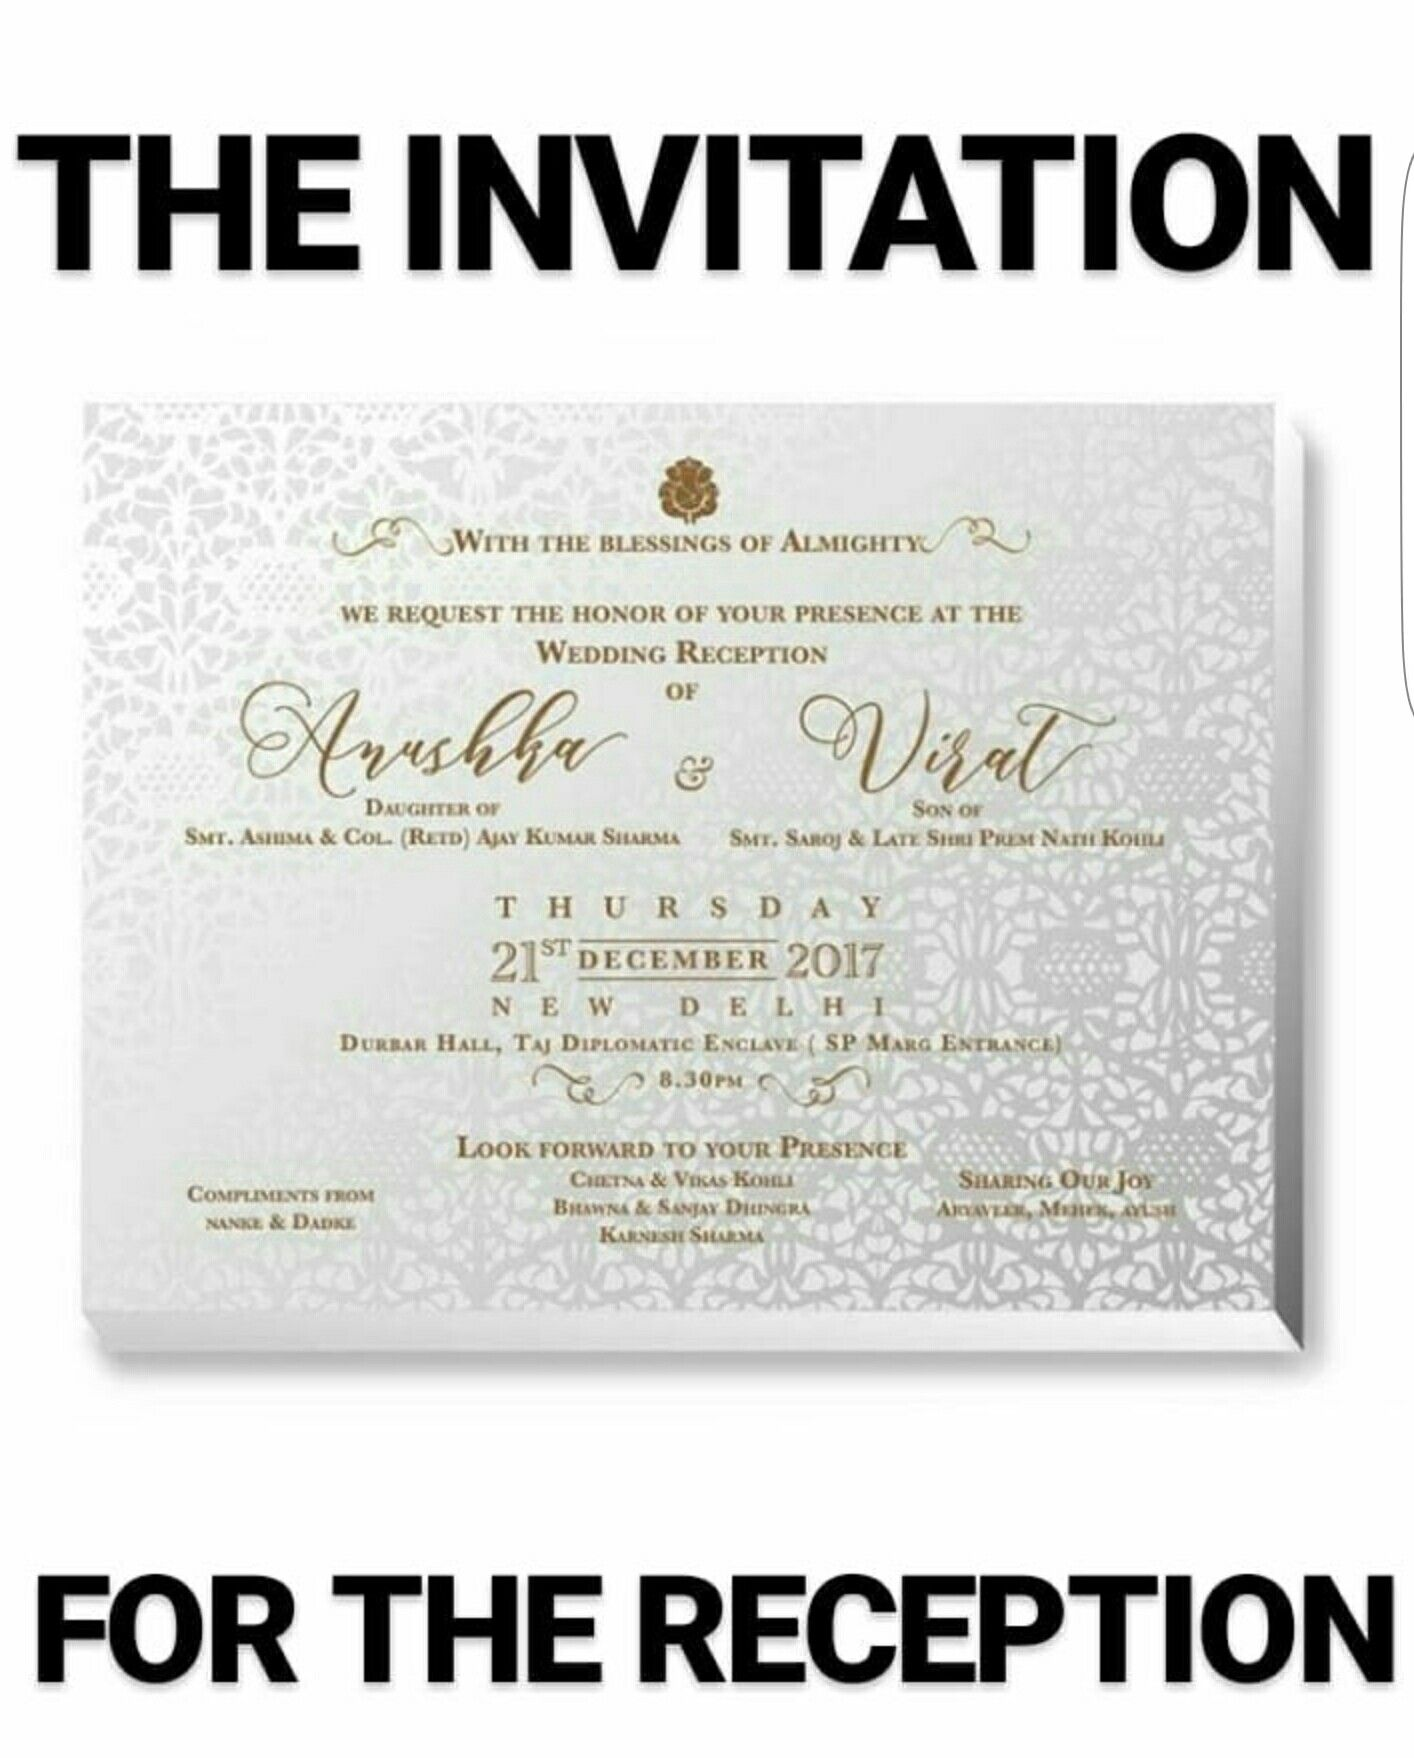 Virat and Anushka ,card. (With images) | Wedding tools ...